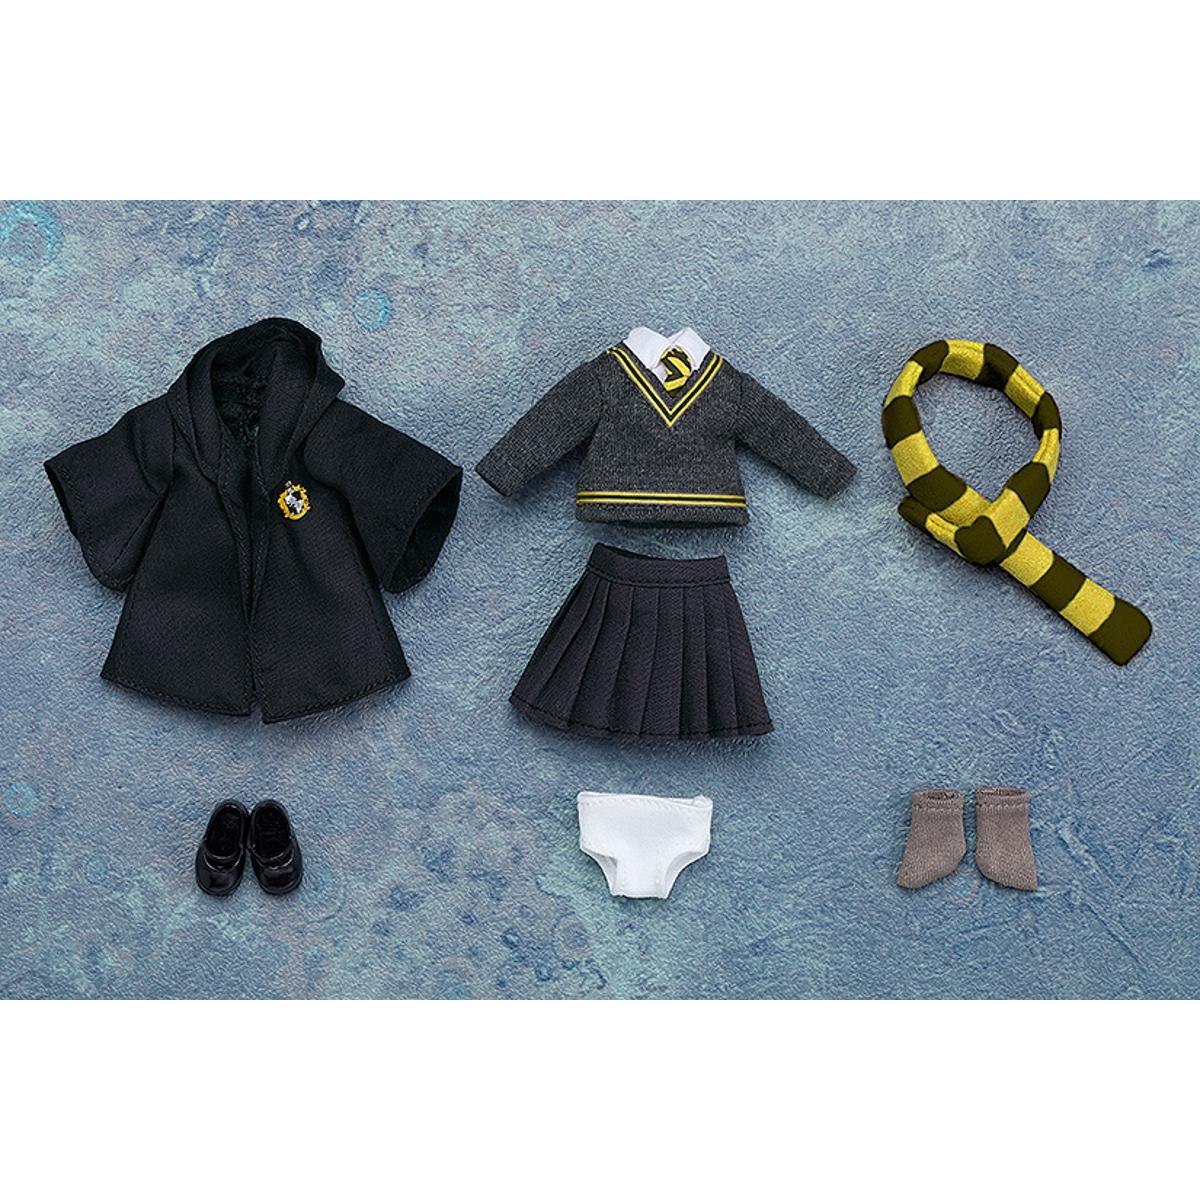 Nendoroid Doll: Outfit Set (Hufflepuff Uniform - Girl)